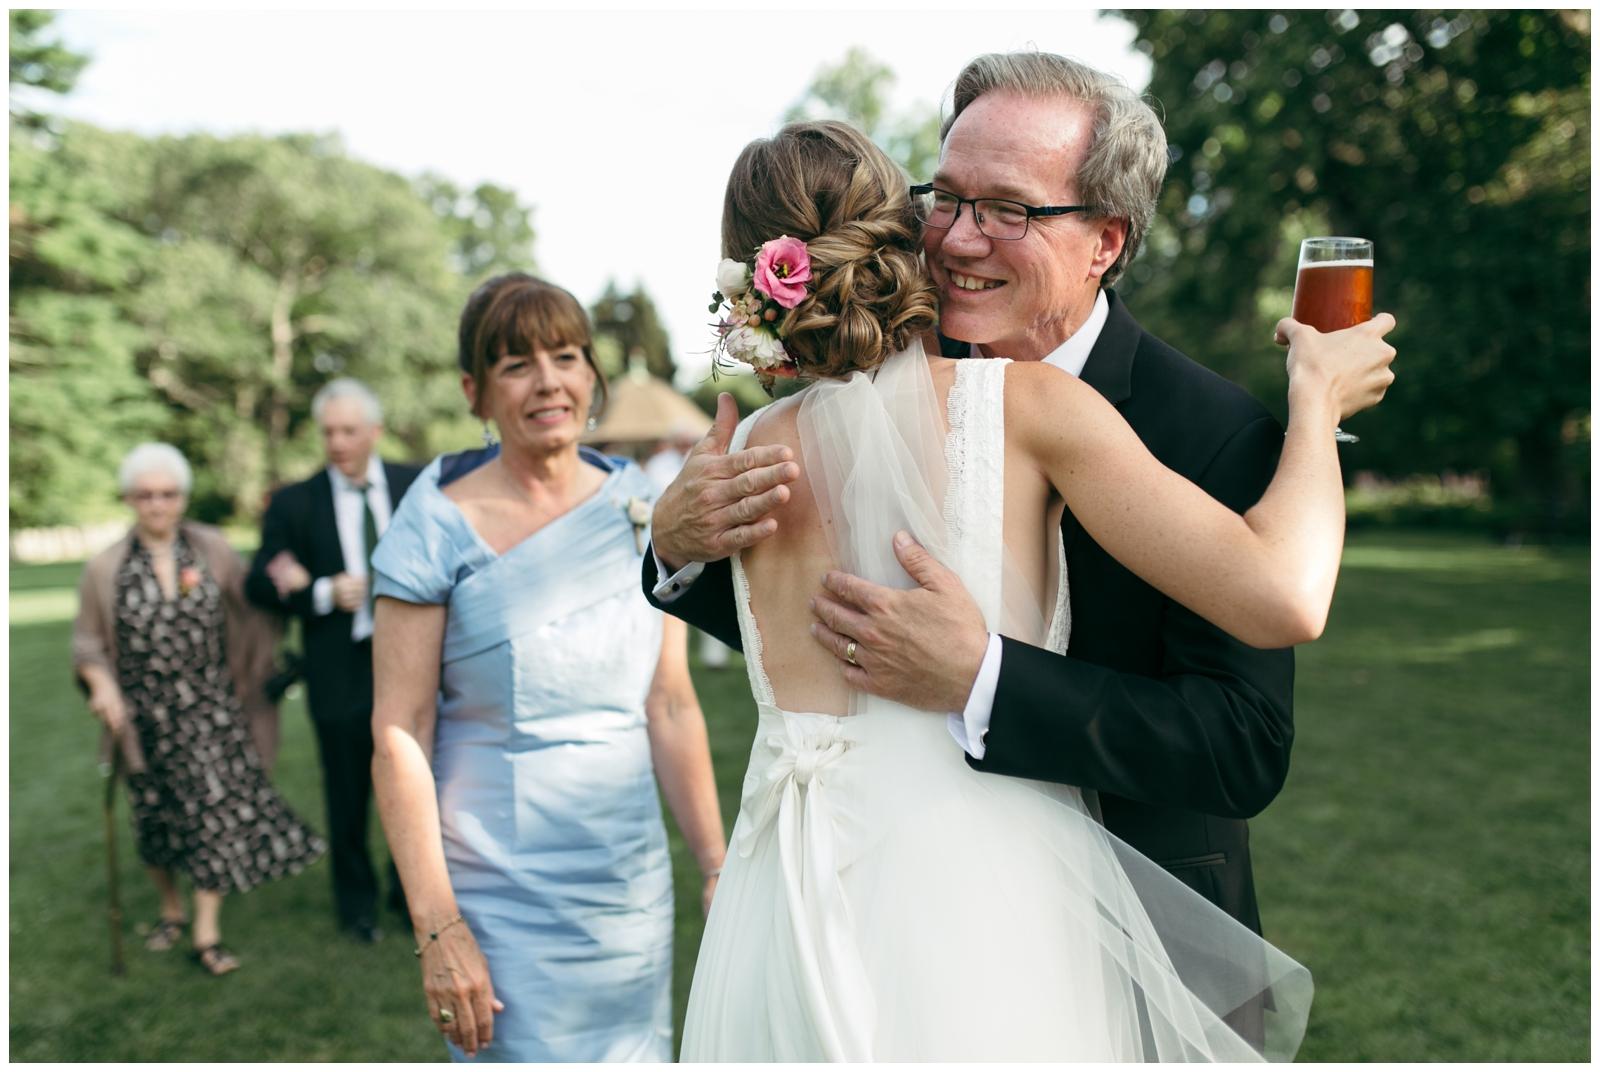 Moraine-Farm-wedding-Bailey-Q-Photo-Massachusetts-wedding-photpgrapher-078.jpg